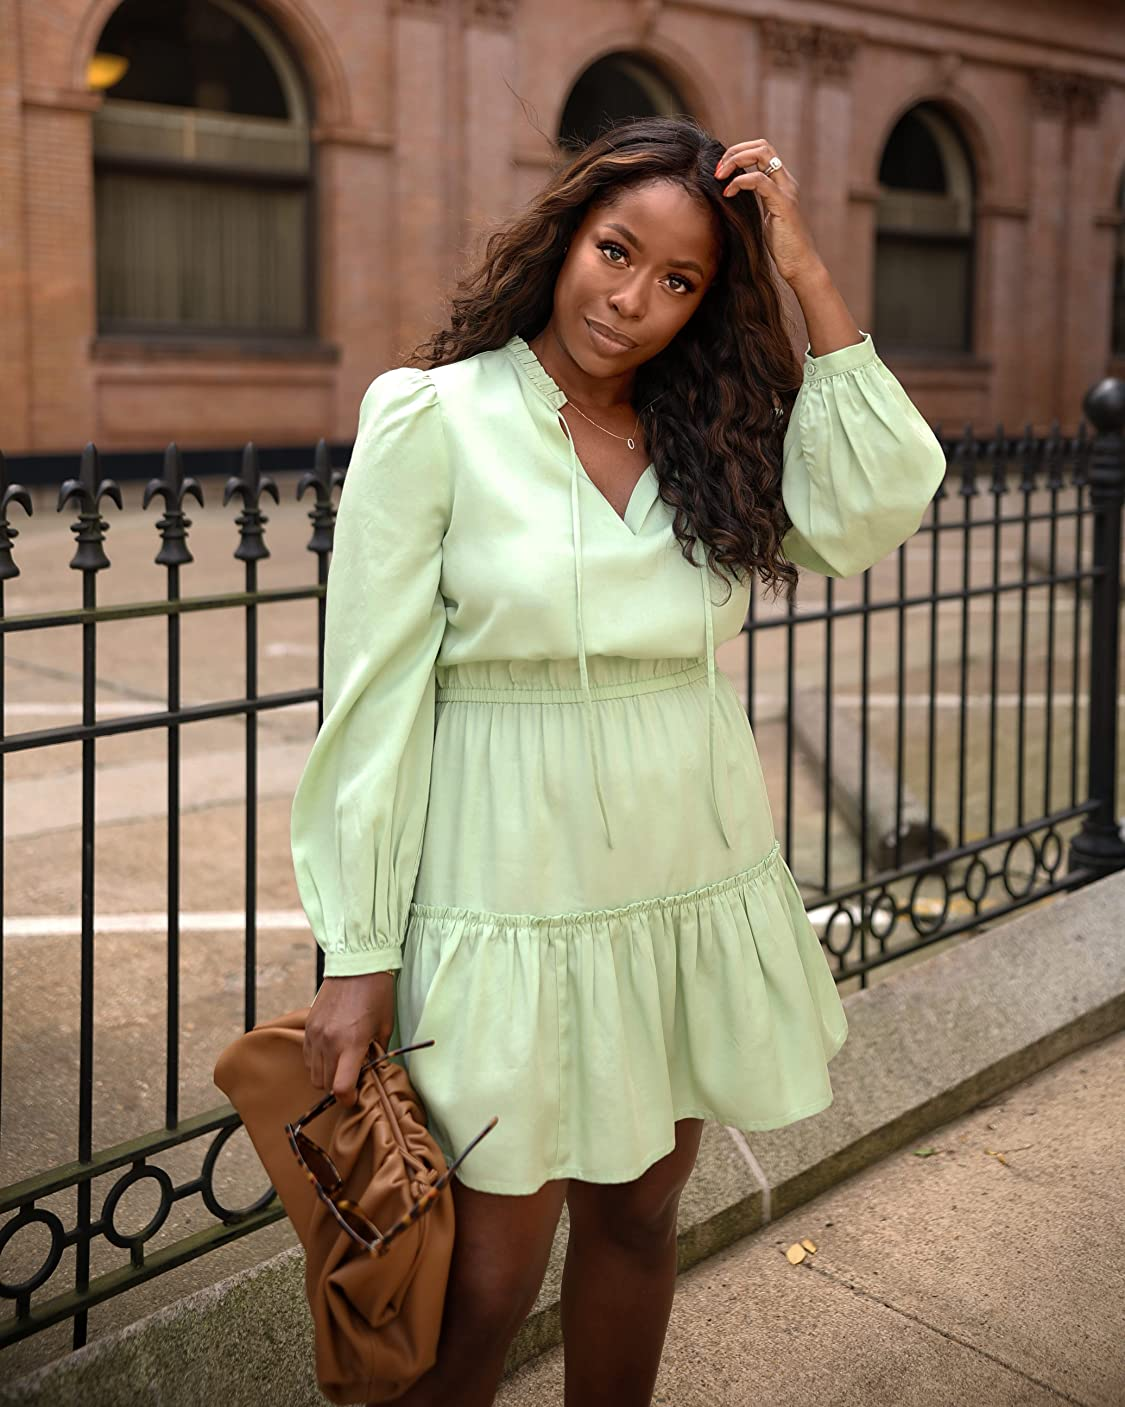 The Drop wears The Drop Women's Smoke Green Long Sleeve V-Neck Mini Dress by @highlowluxxe